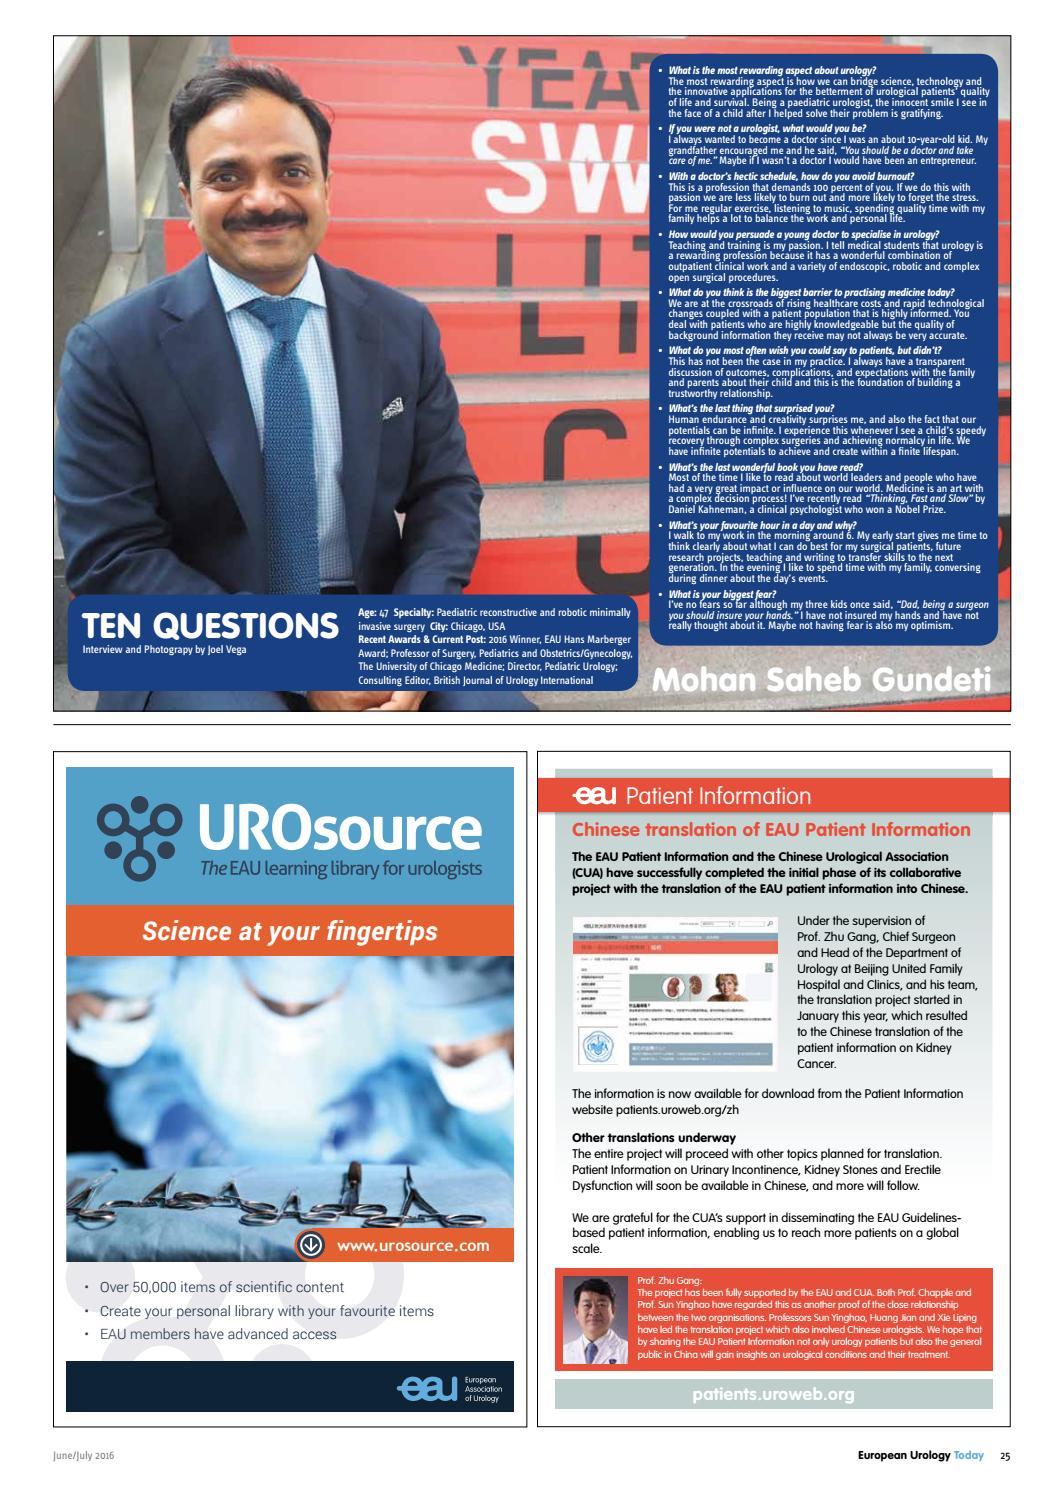 European Urology Today (EUT) June/July 2016 by European